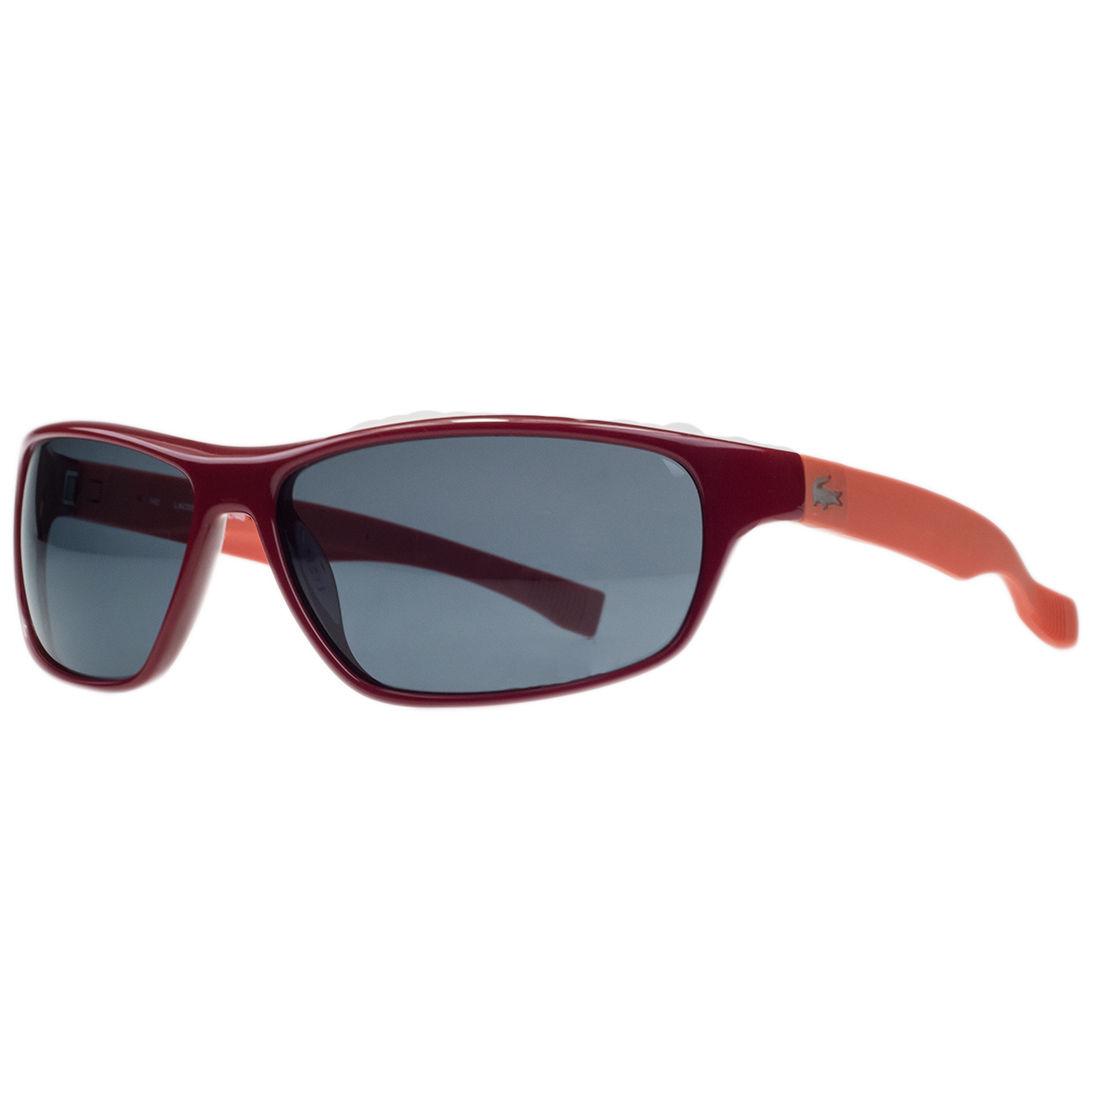 Lacoste L744/S 615 Red Rectangular Sunglasses